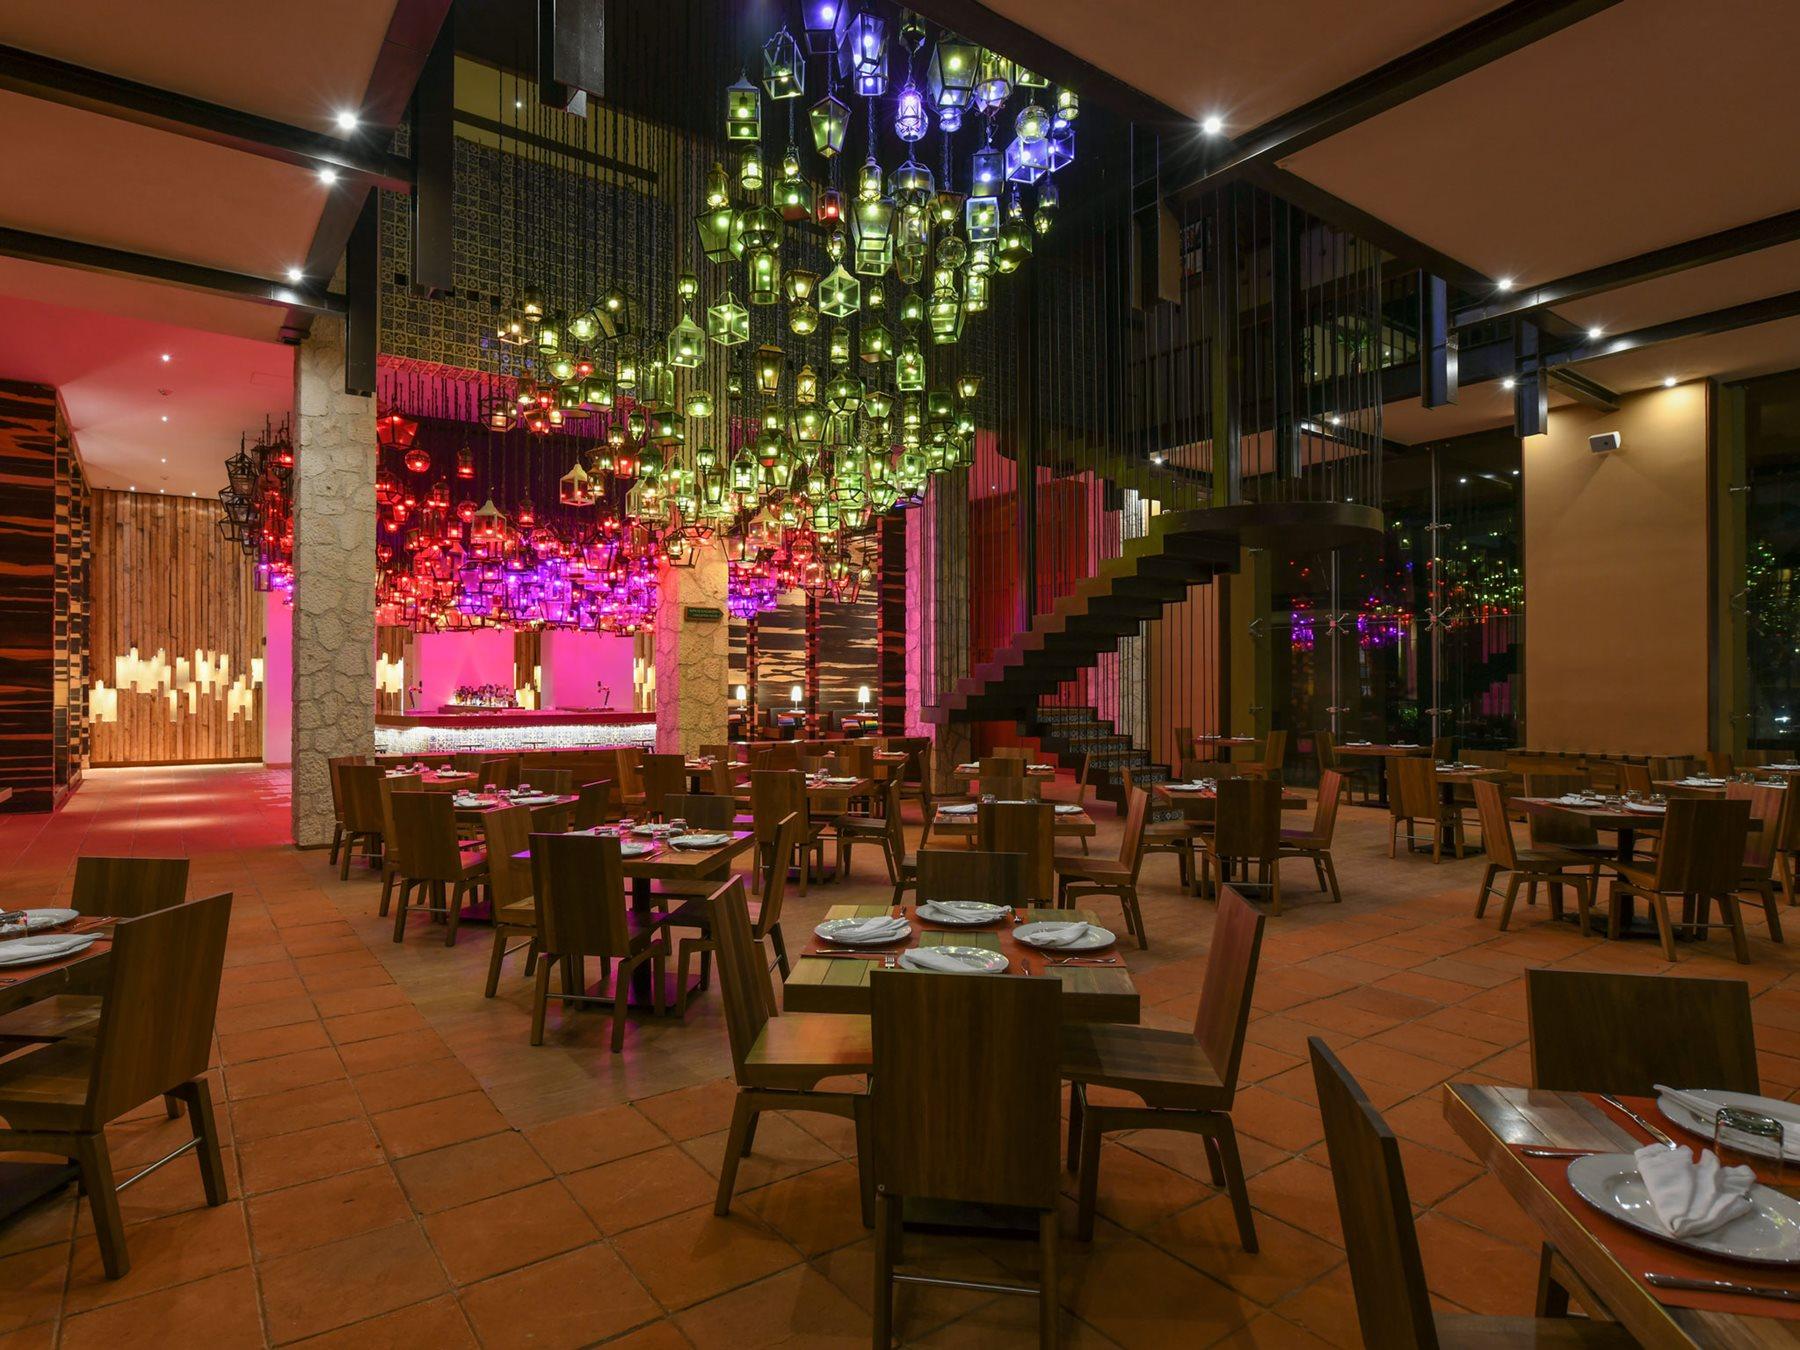 RIV-Hotel-Xcaret-Resto-La-Cantina-001